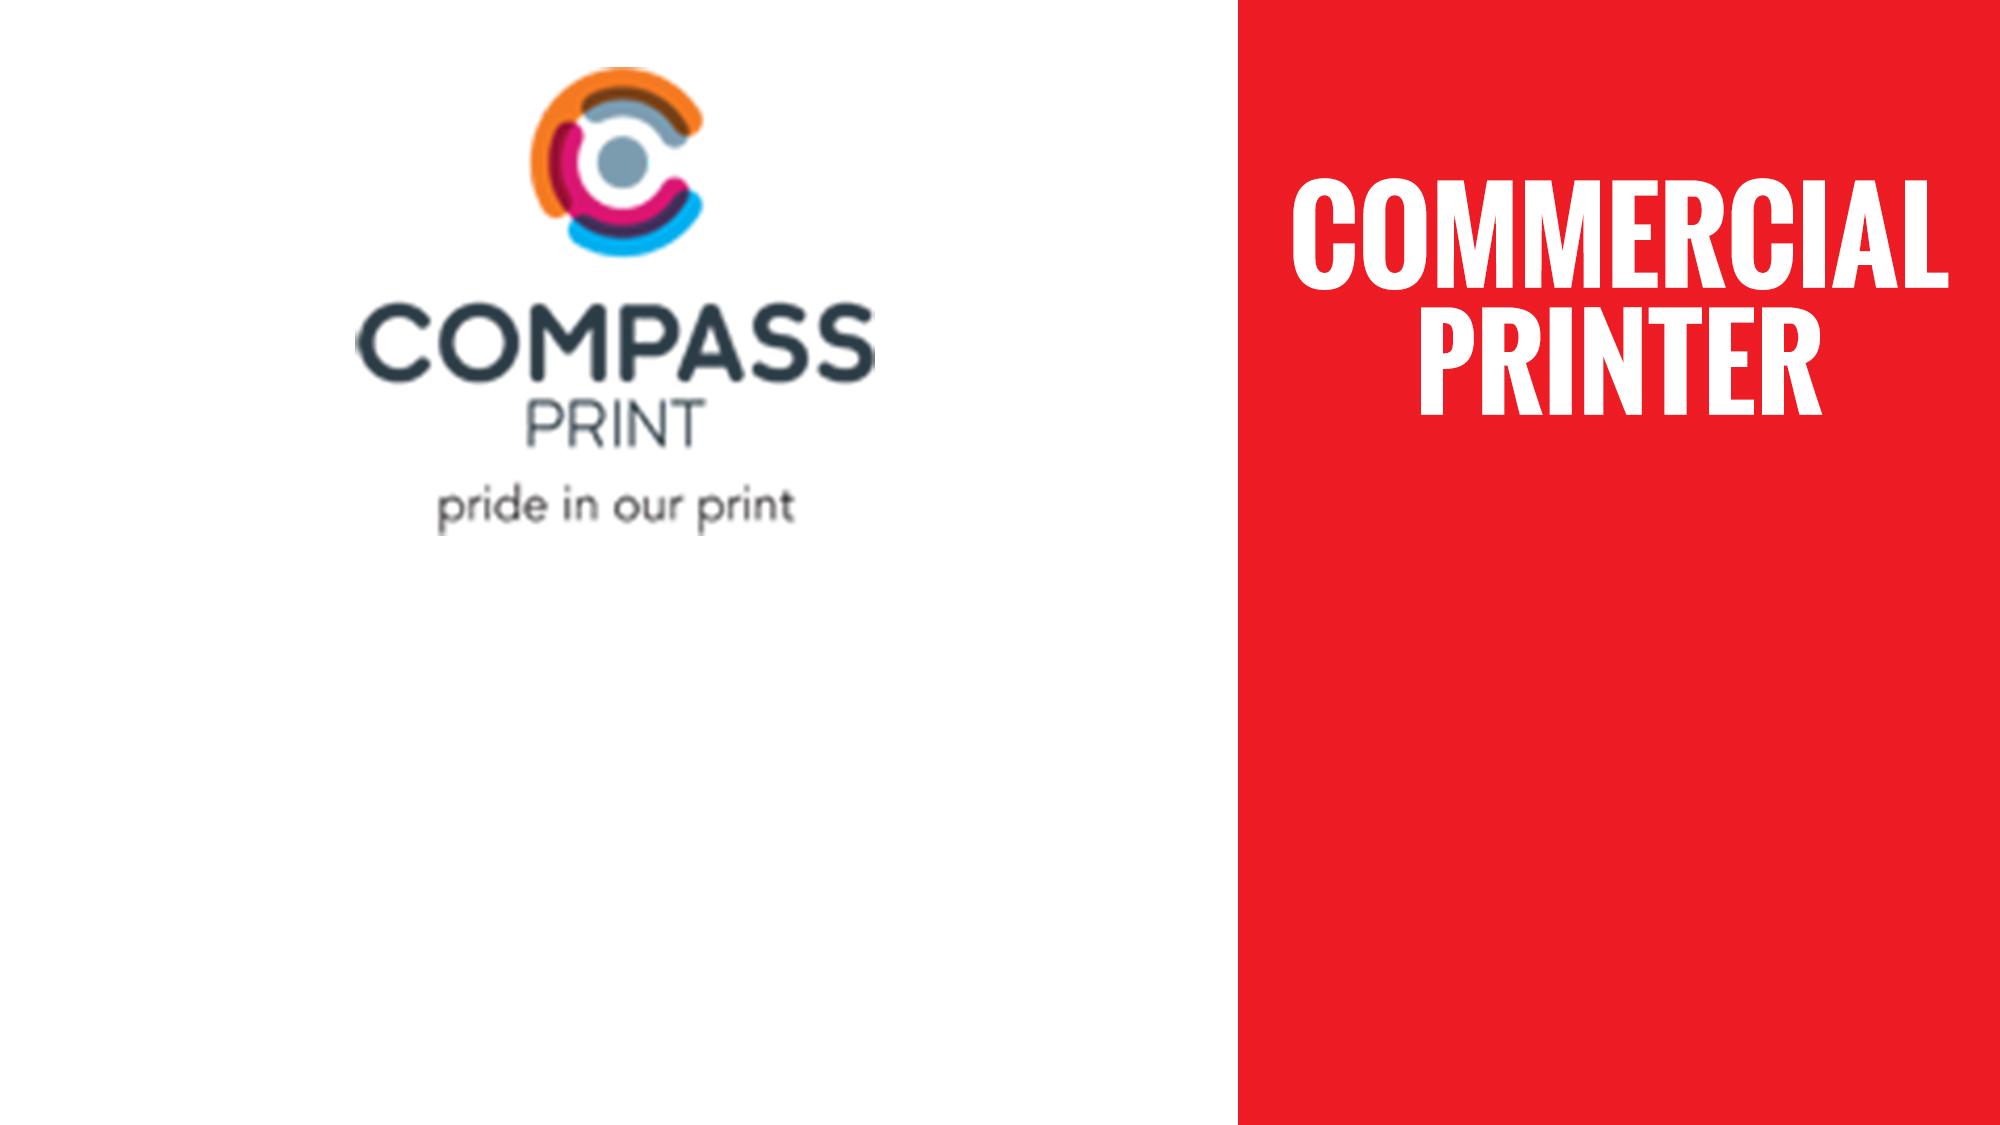 Compass Print